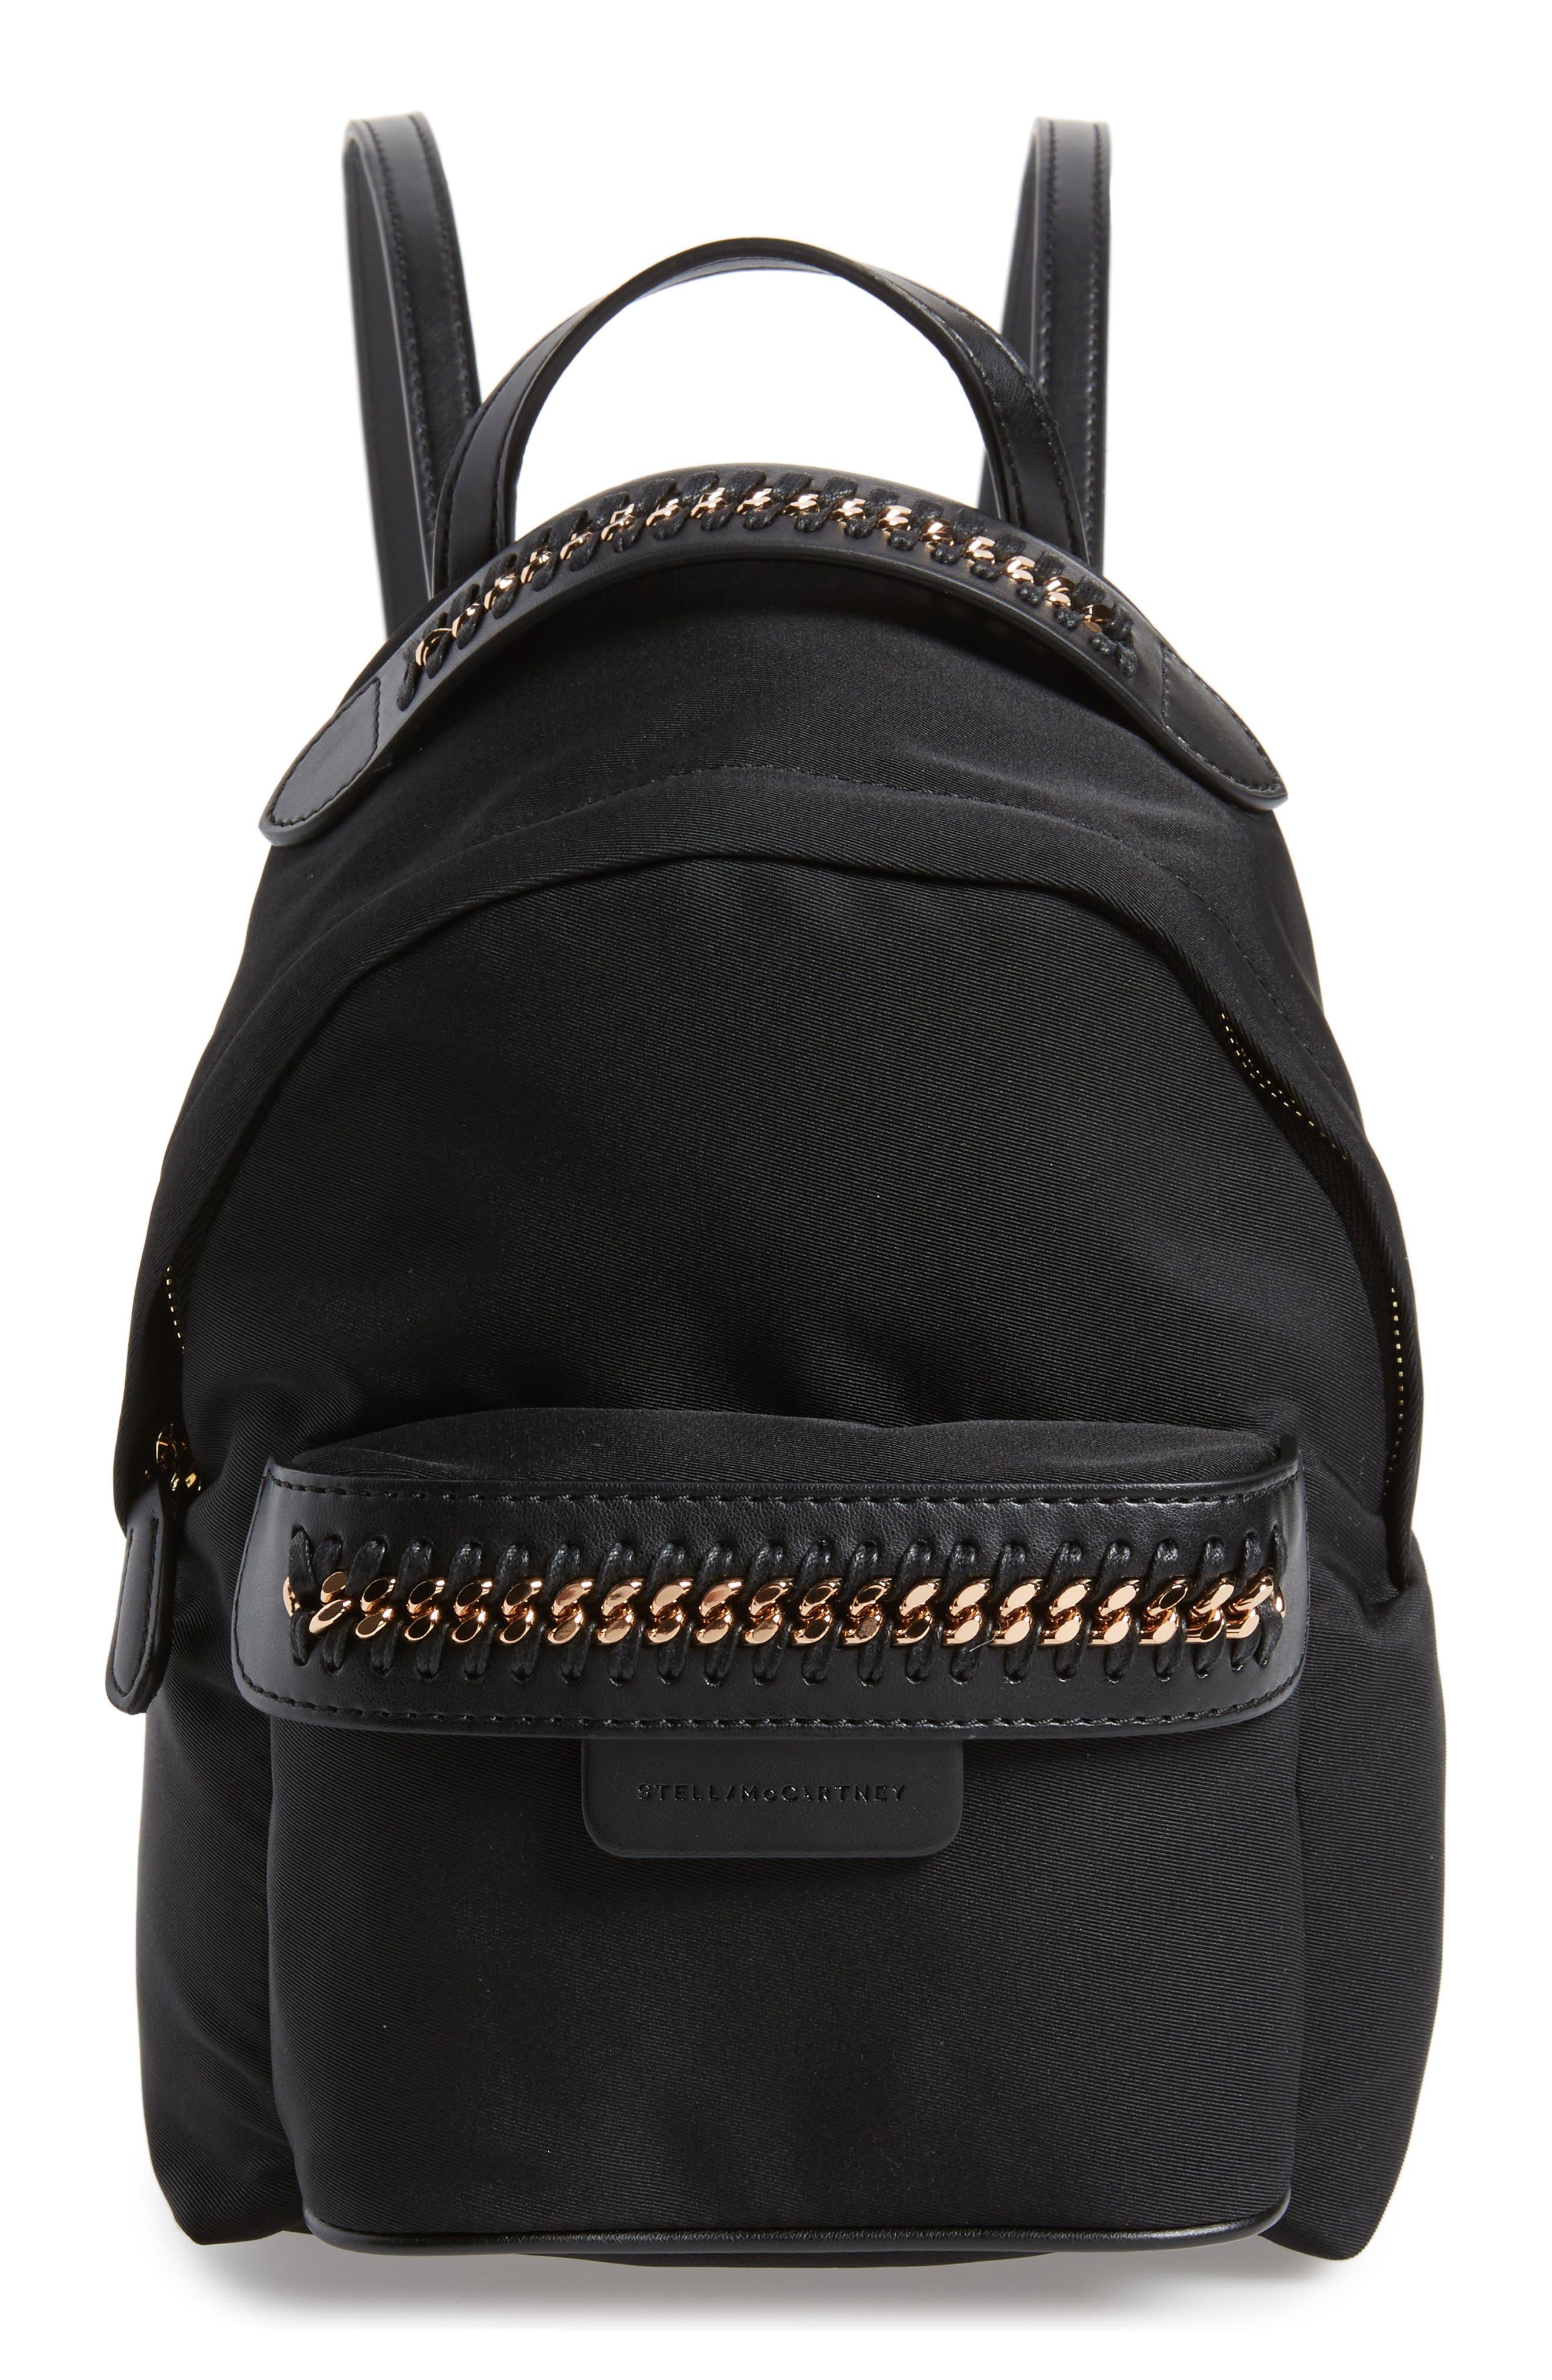 Stella McCartney Mini Falabella Nylon Backpack